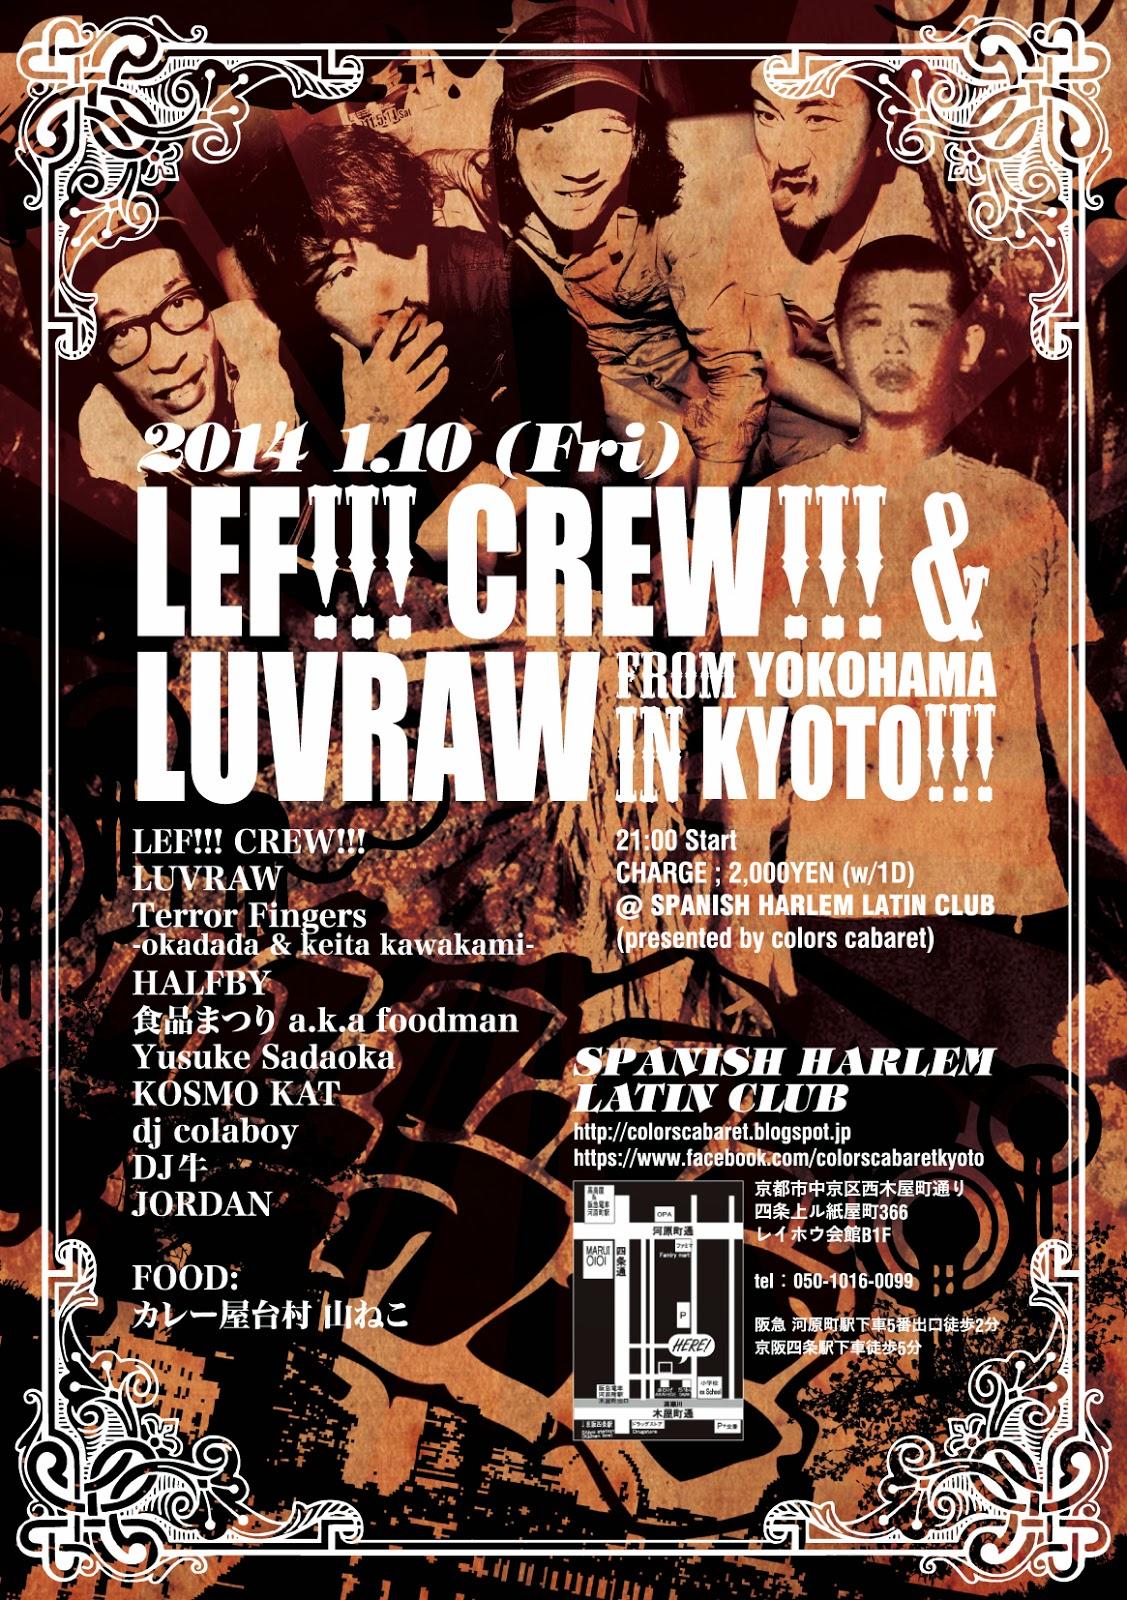 lefcrew_luvraw_kyoto_20140110.jpg